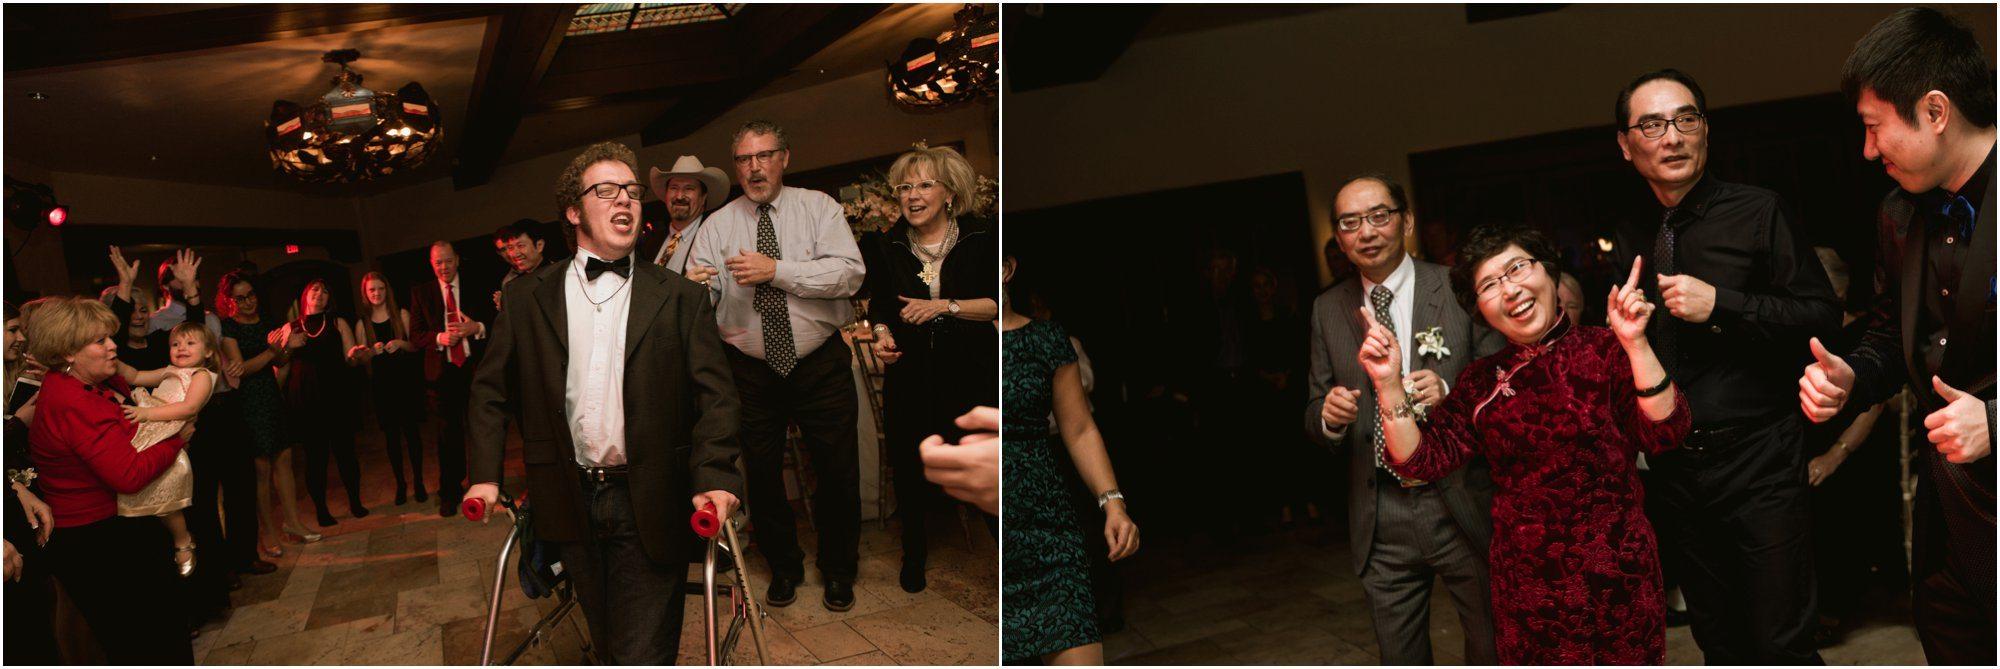 038Albuquerque wedding photographers_ Blue Rose Photography_ Santa Fe wedding photographers_ New Mexico Wedding photography